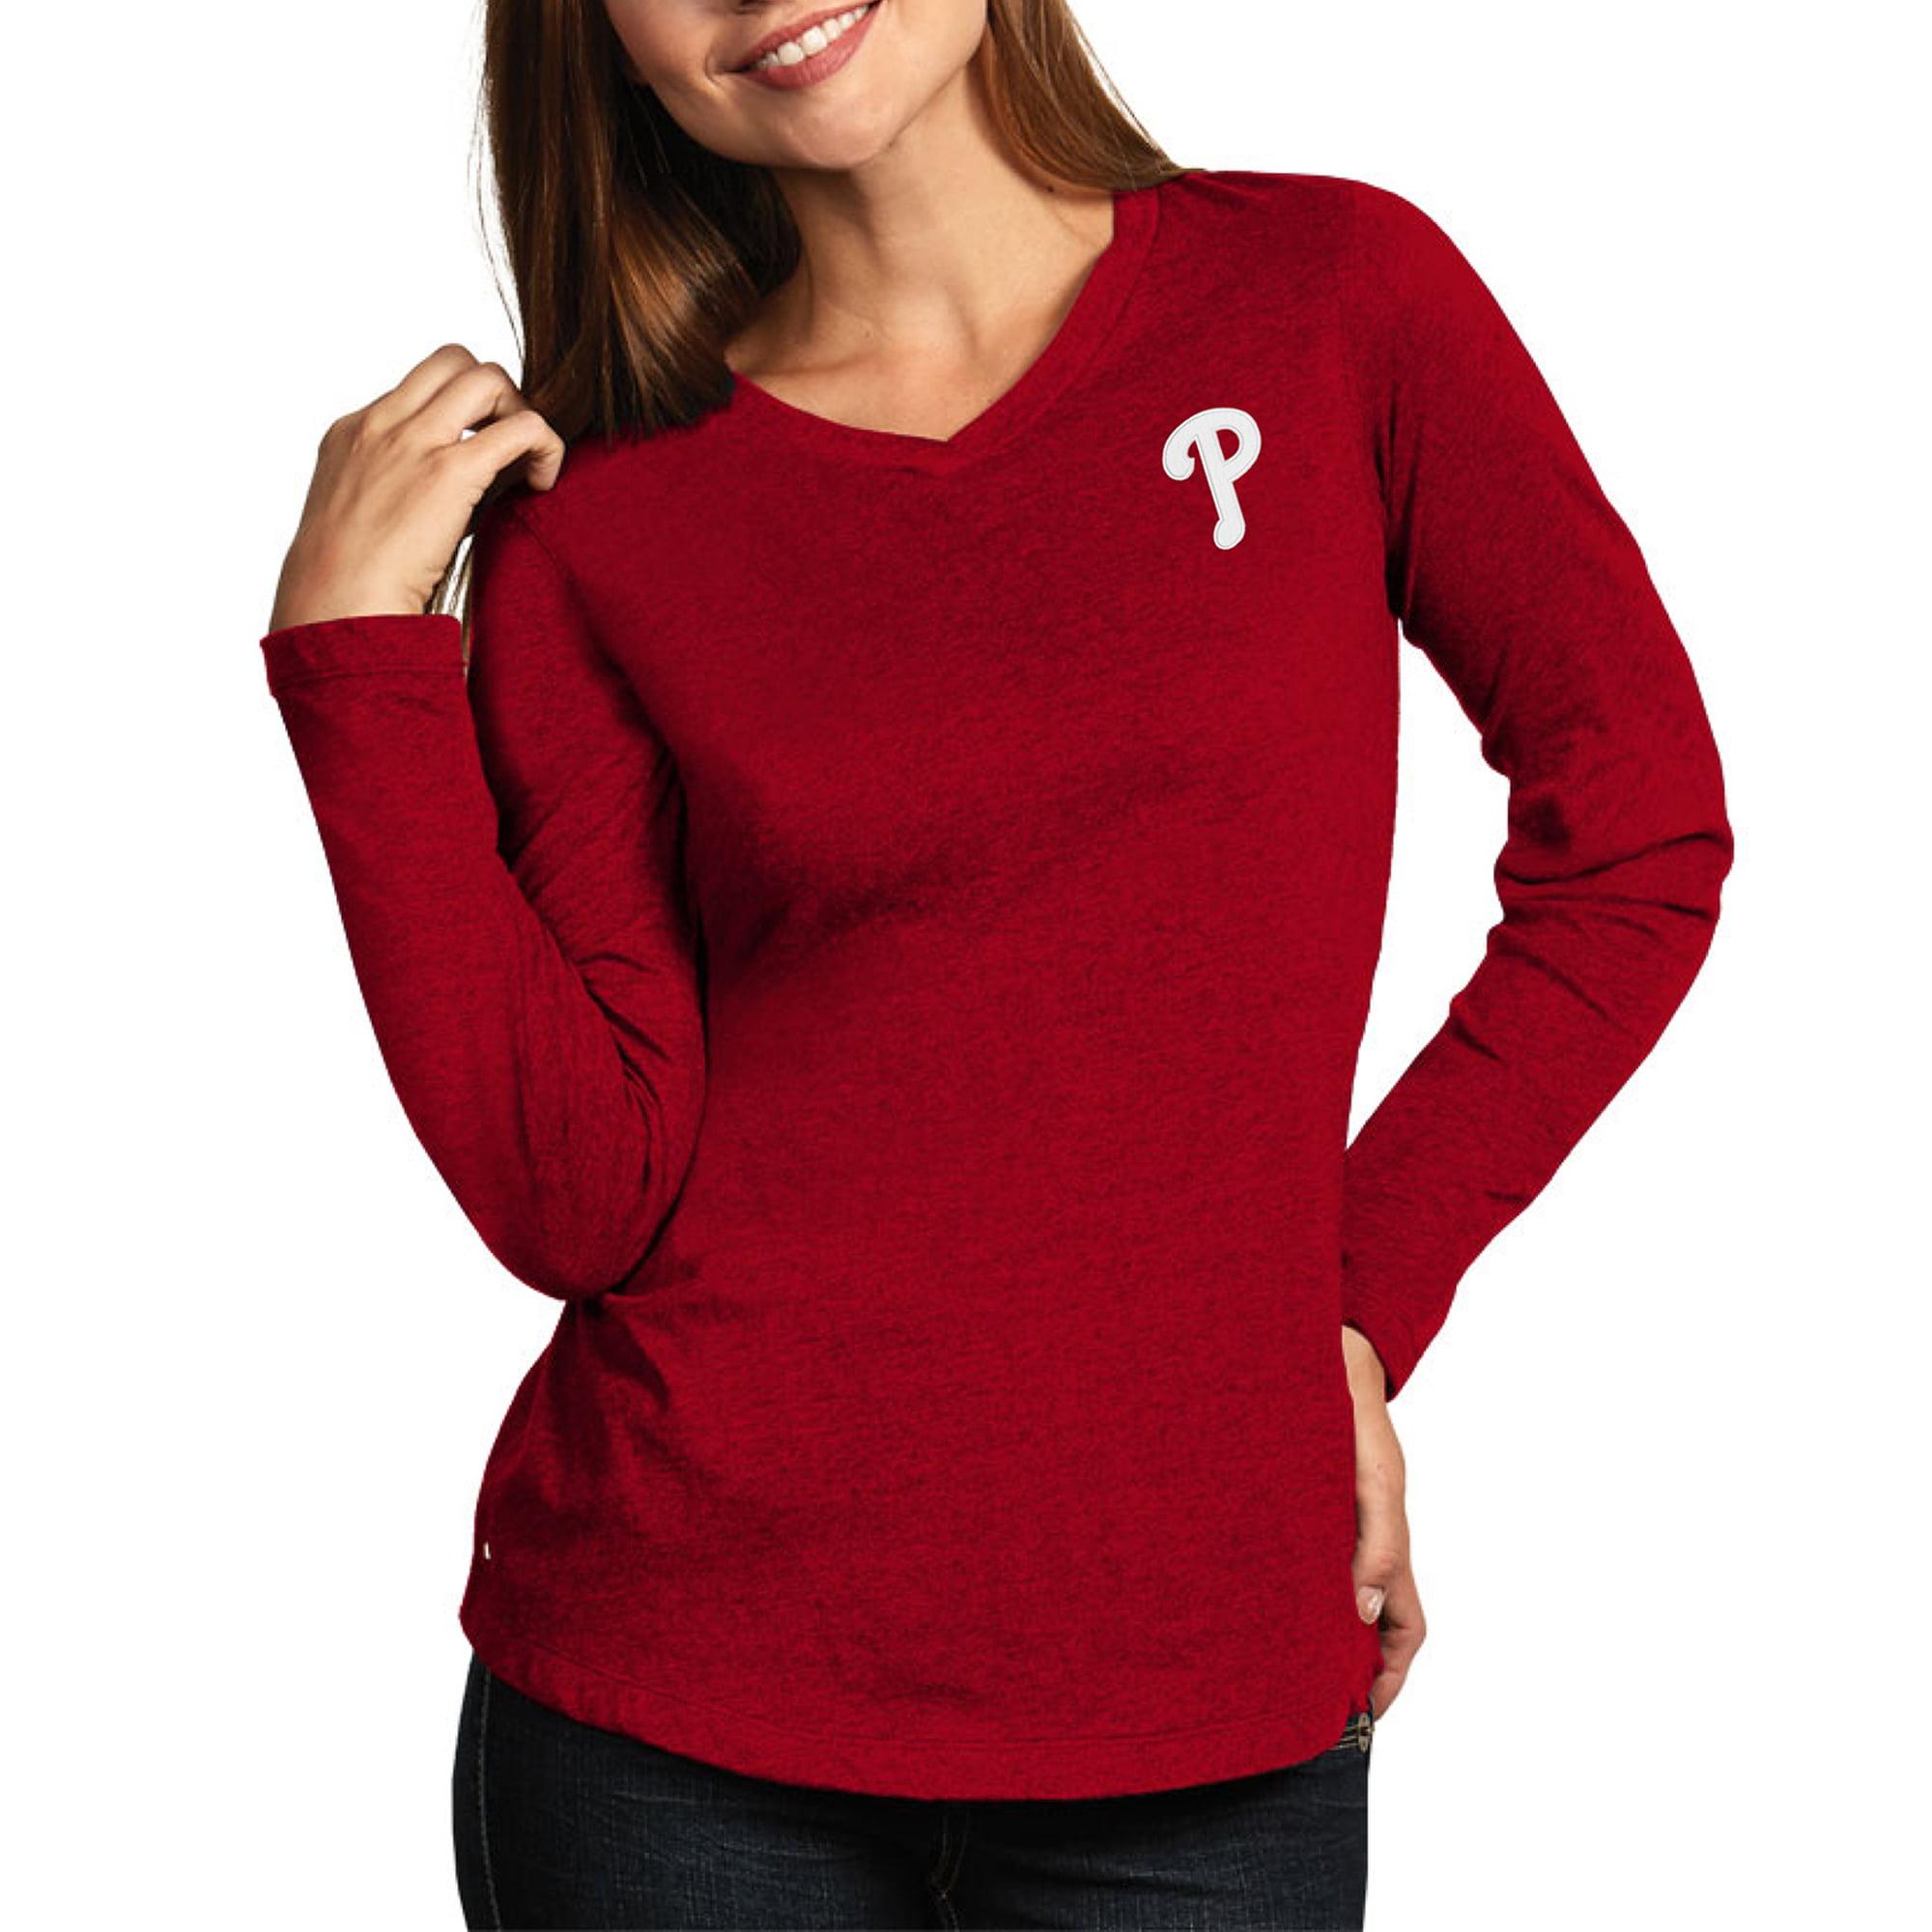 Philadelphia Phillies Antigua Women's Flip Long Sleeve T-Shirt - Heather Red